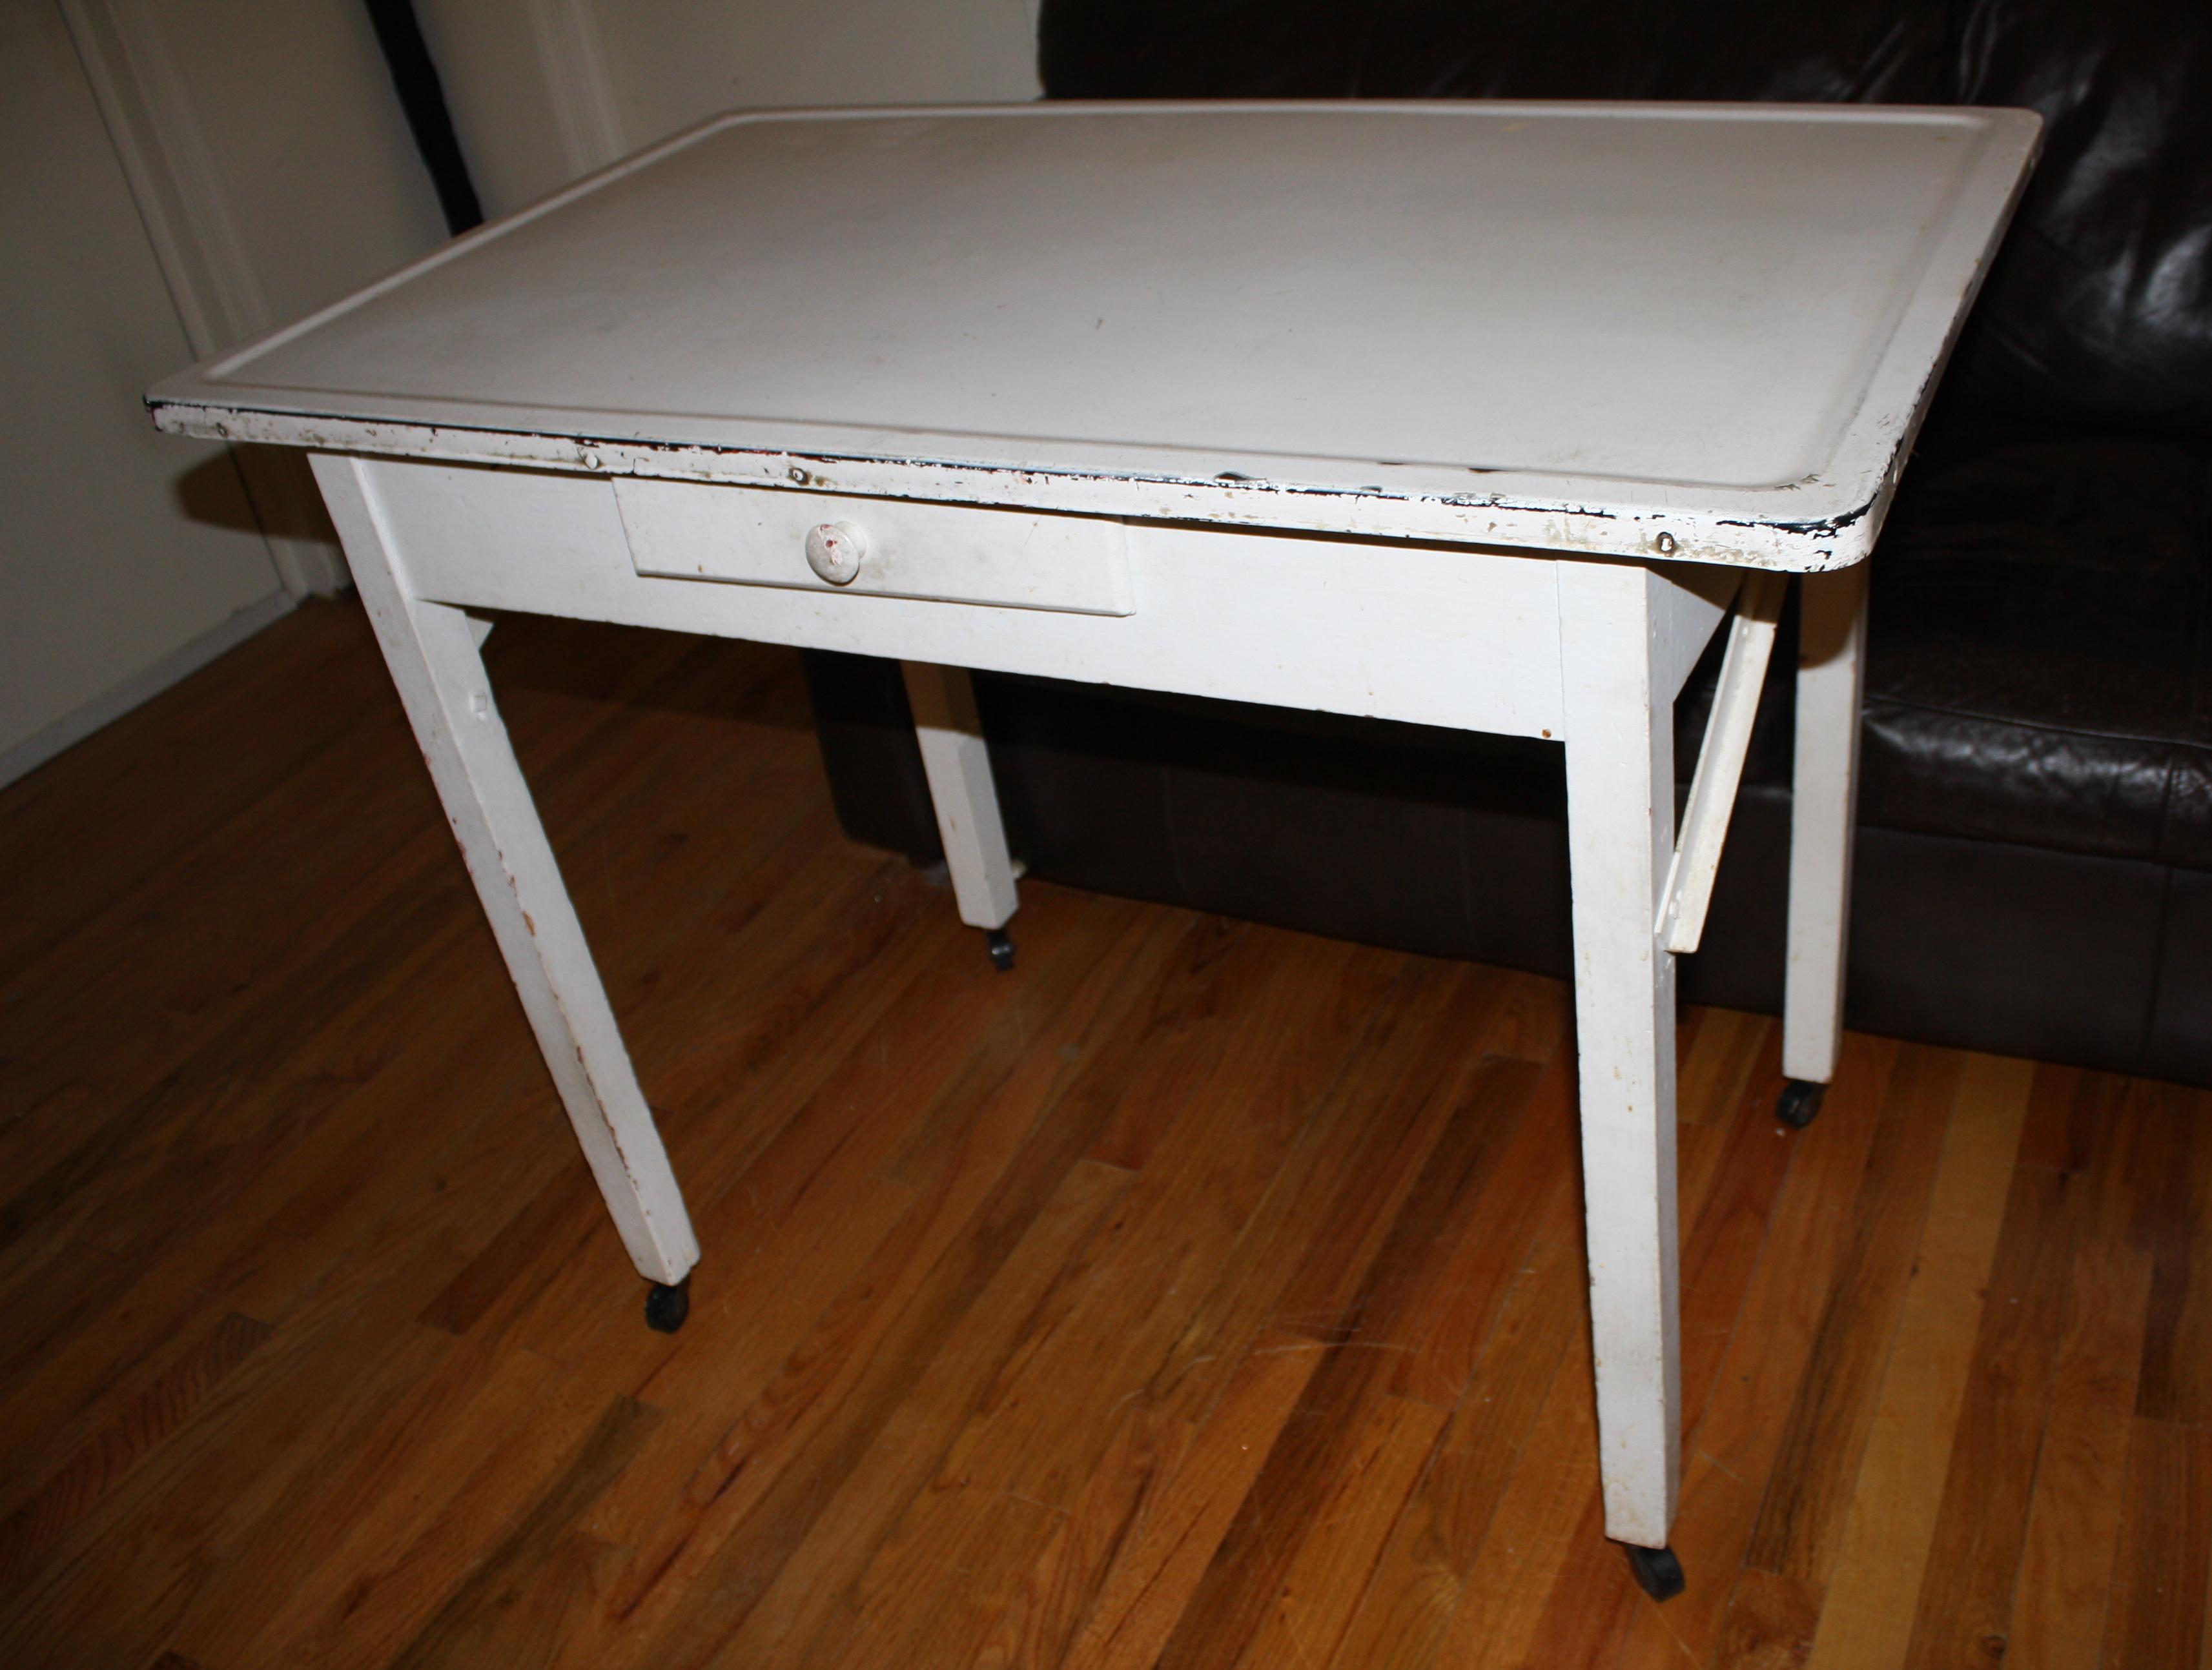 metal kitchen tables roller island antique farmhouse baker table with porcelain enamel top picked vintage